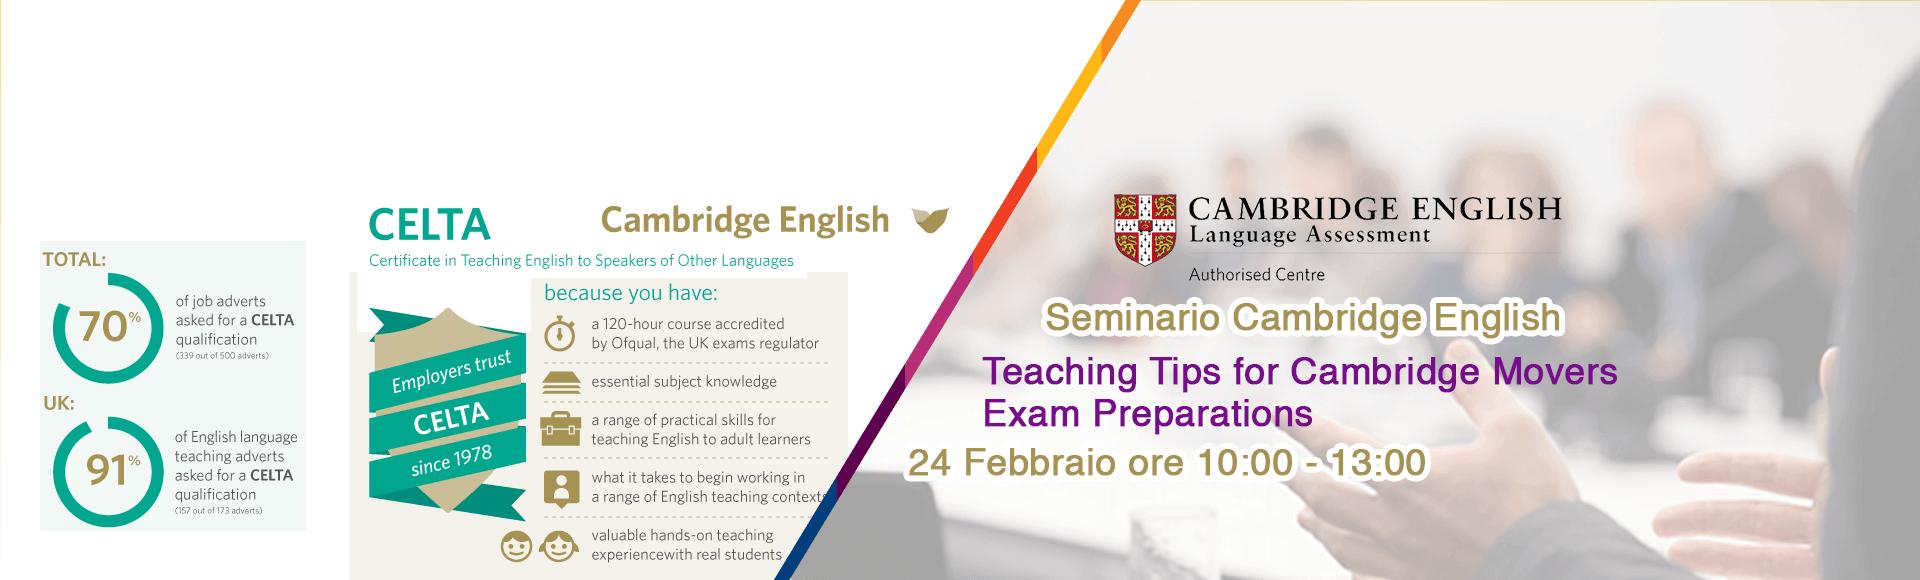 Seminario 24 Febbraio Cambridge Catania